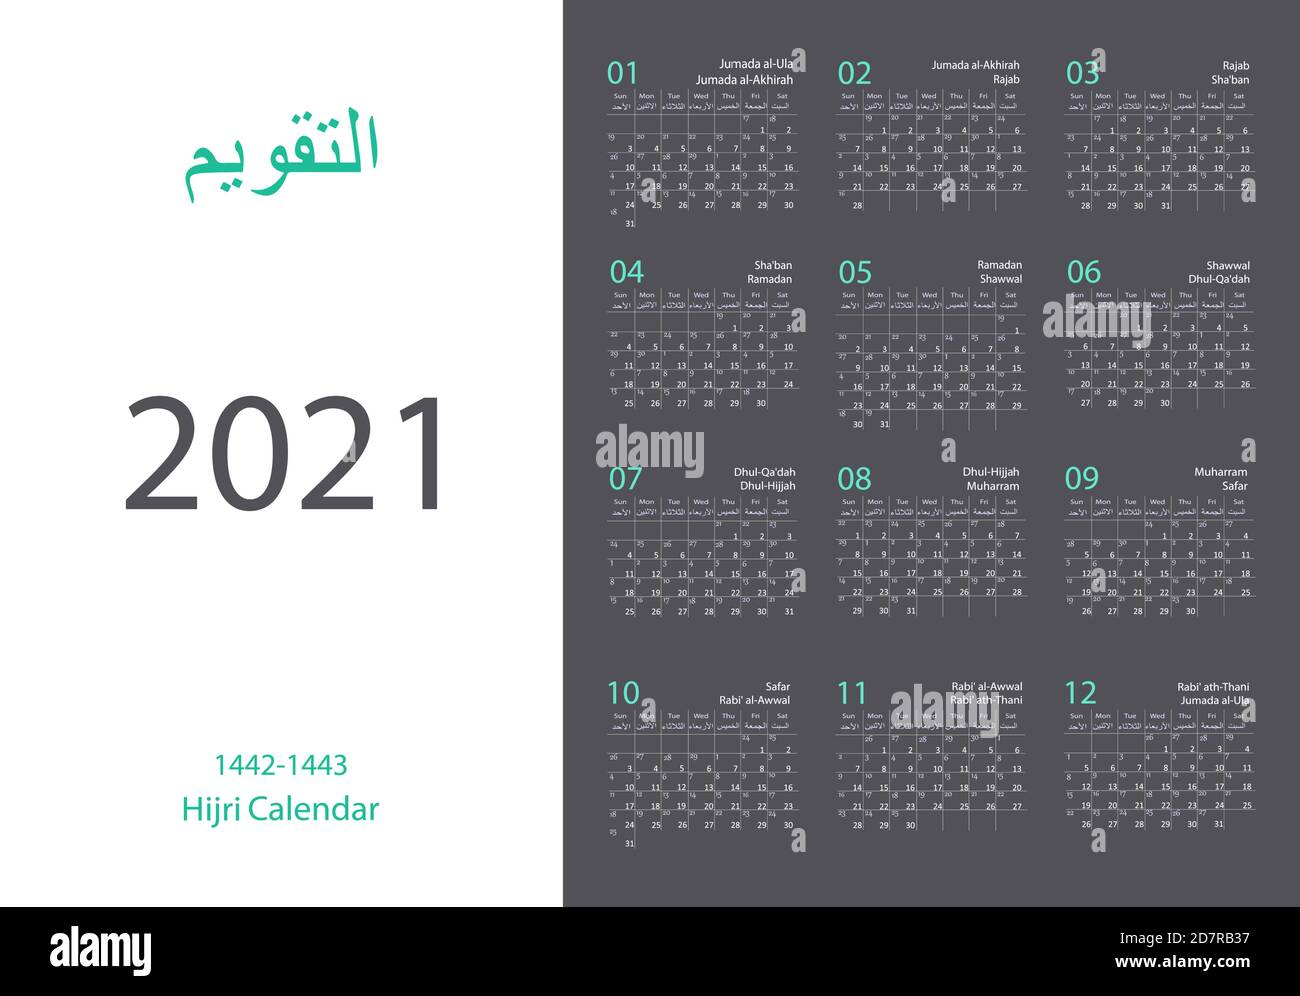 Calendrier Hegire 2022 Hijra Calendar High Resolution Stock Photography and Images   Alamy